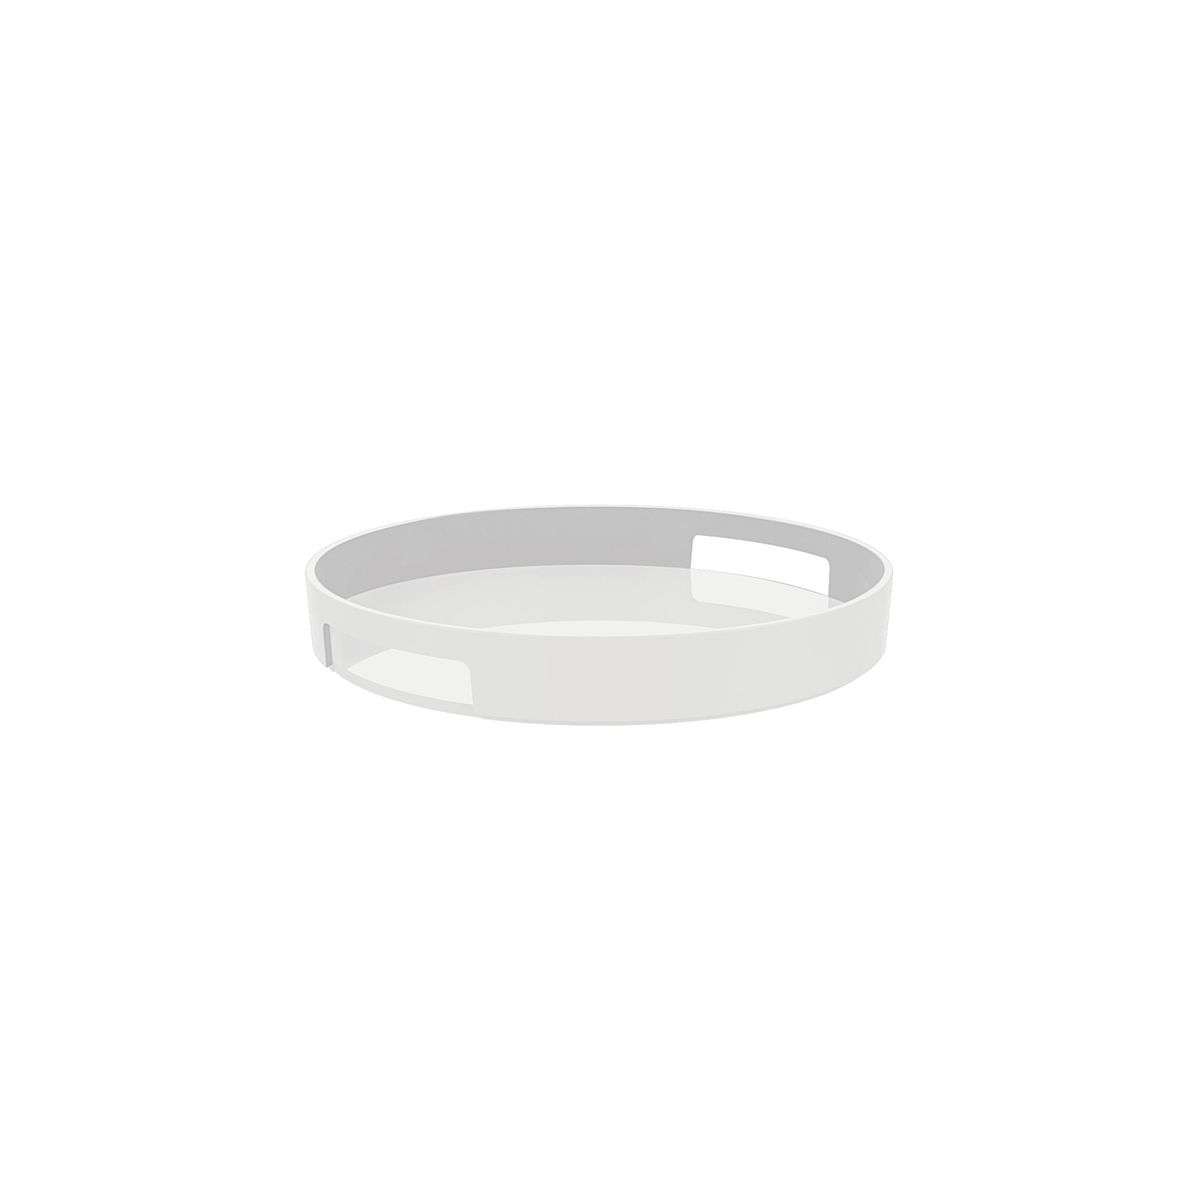 Gallery - Plateau rond 30 cm blanc - Zak! Designs